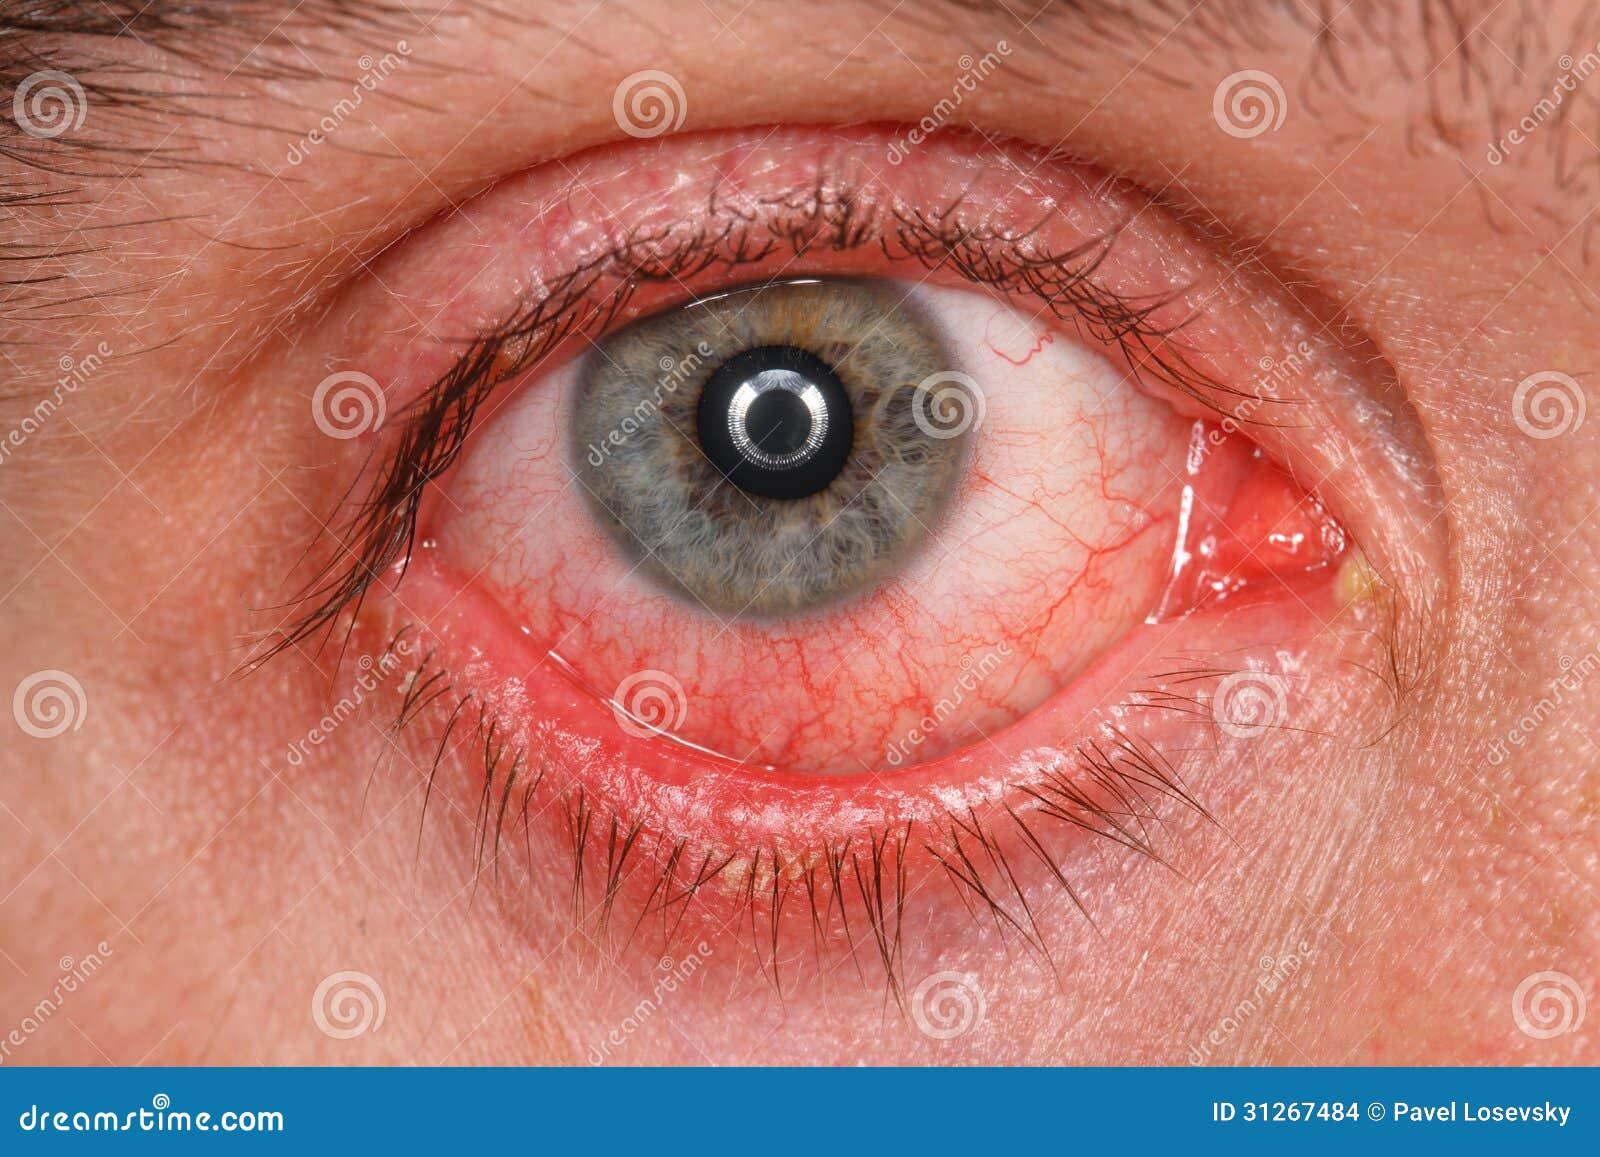 Хронический глаз конюнктивита